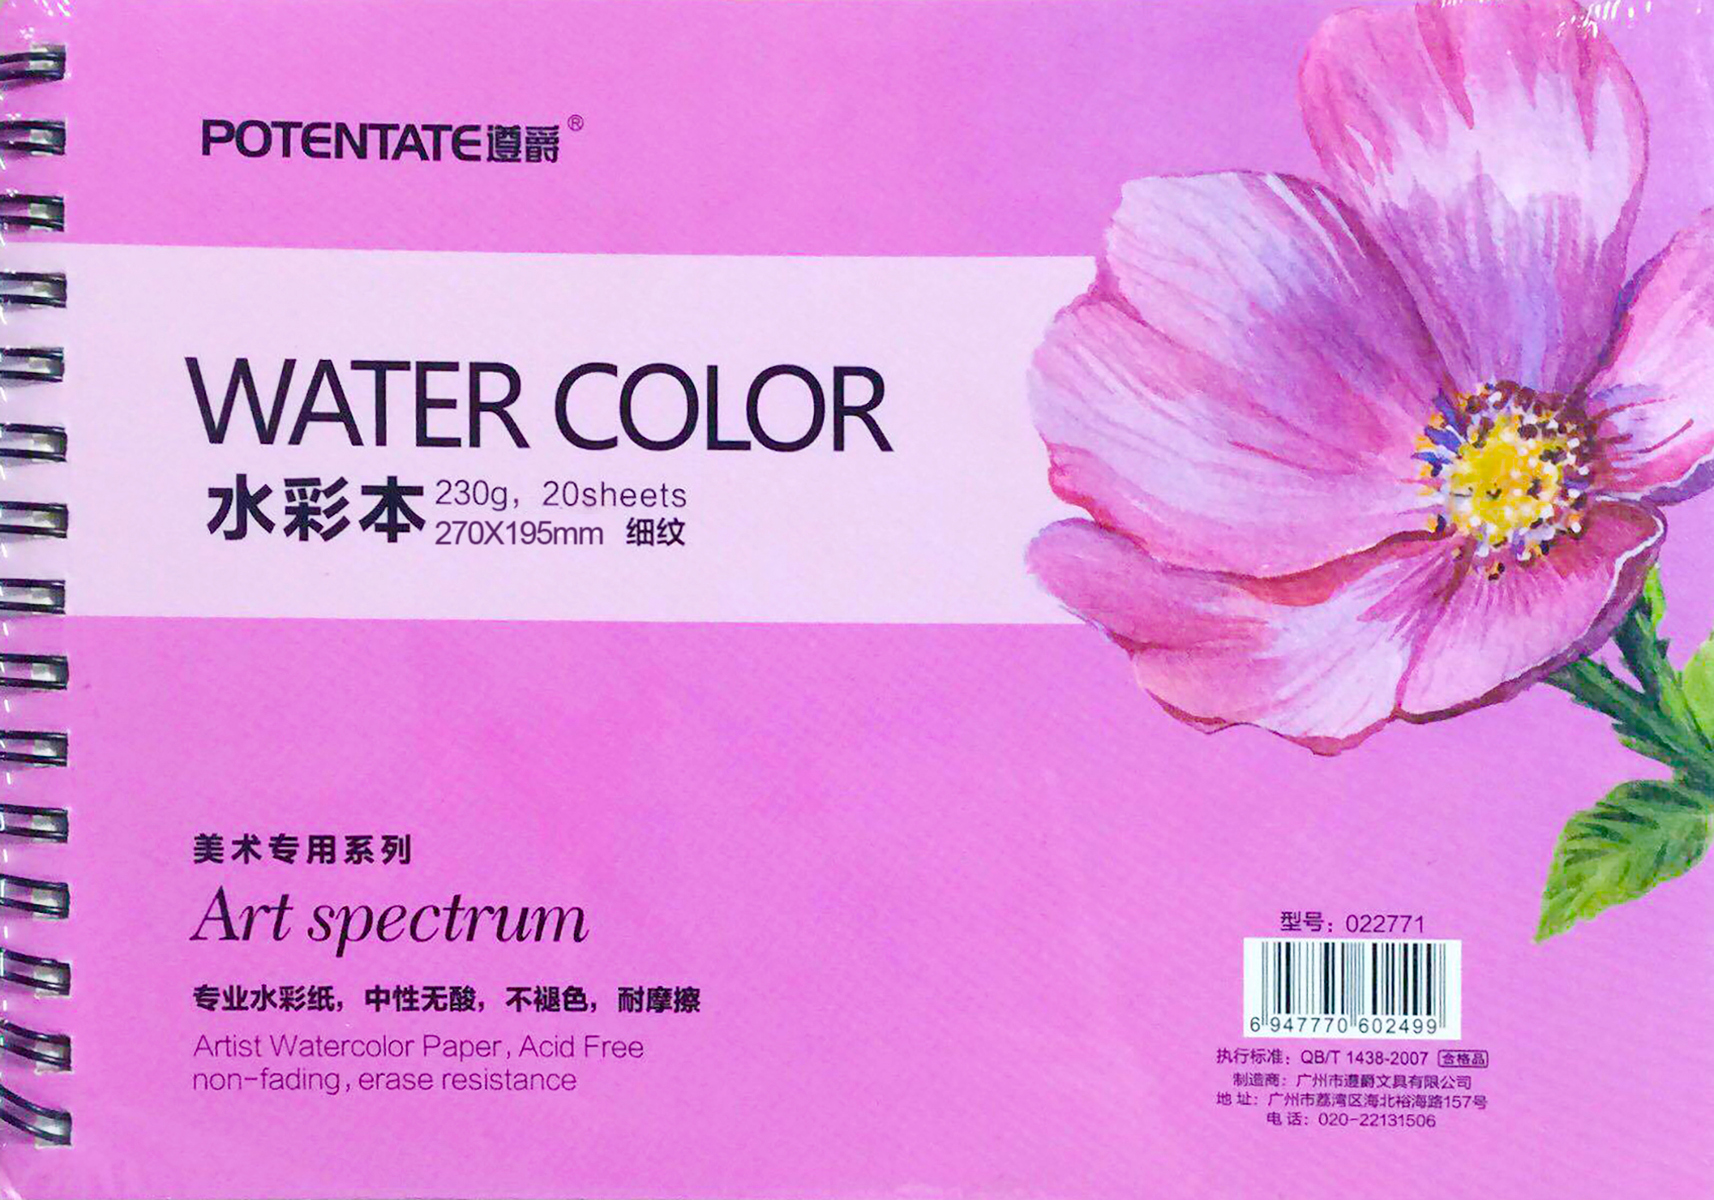 Potentate Бумага для рисования Watercolor Pad Smooth Surface 20 л 270 x 195 мм